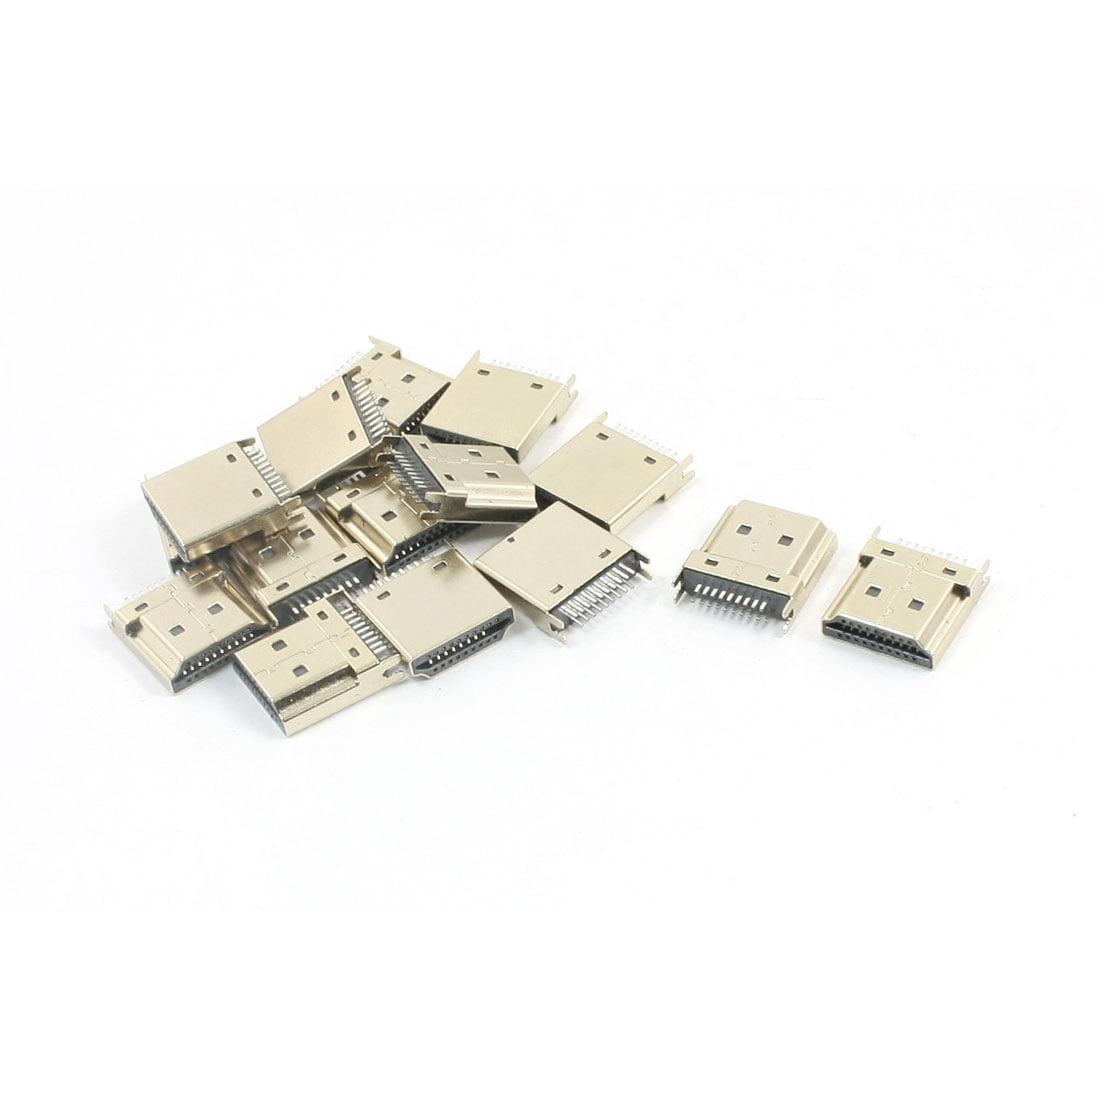 15pcs Gold Tone 1.2mm Slot Width Mini 19Pin HDMI Female Connector SMT 180 Degree